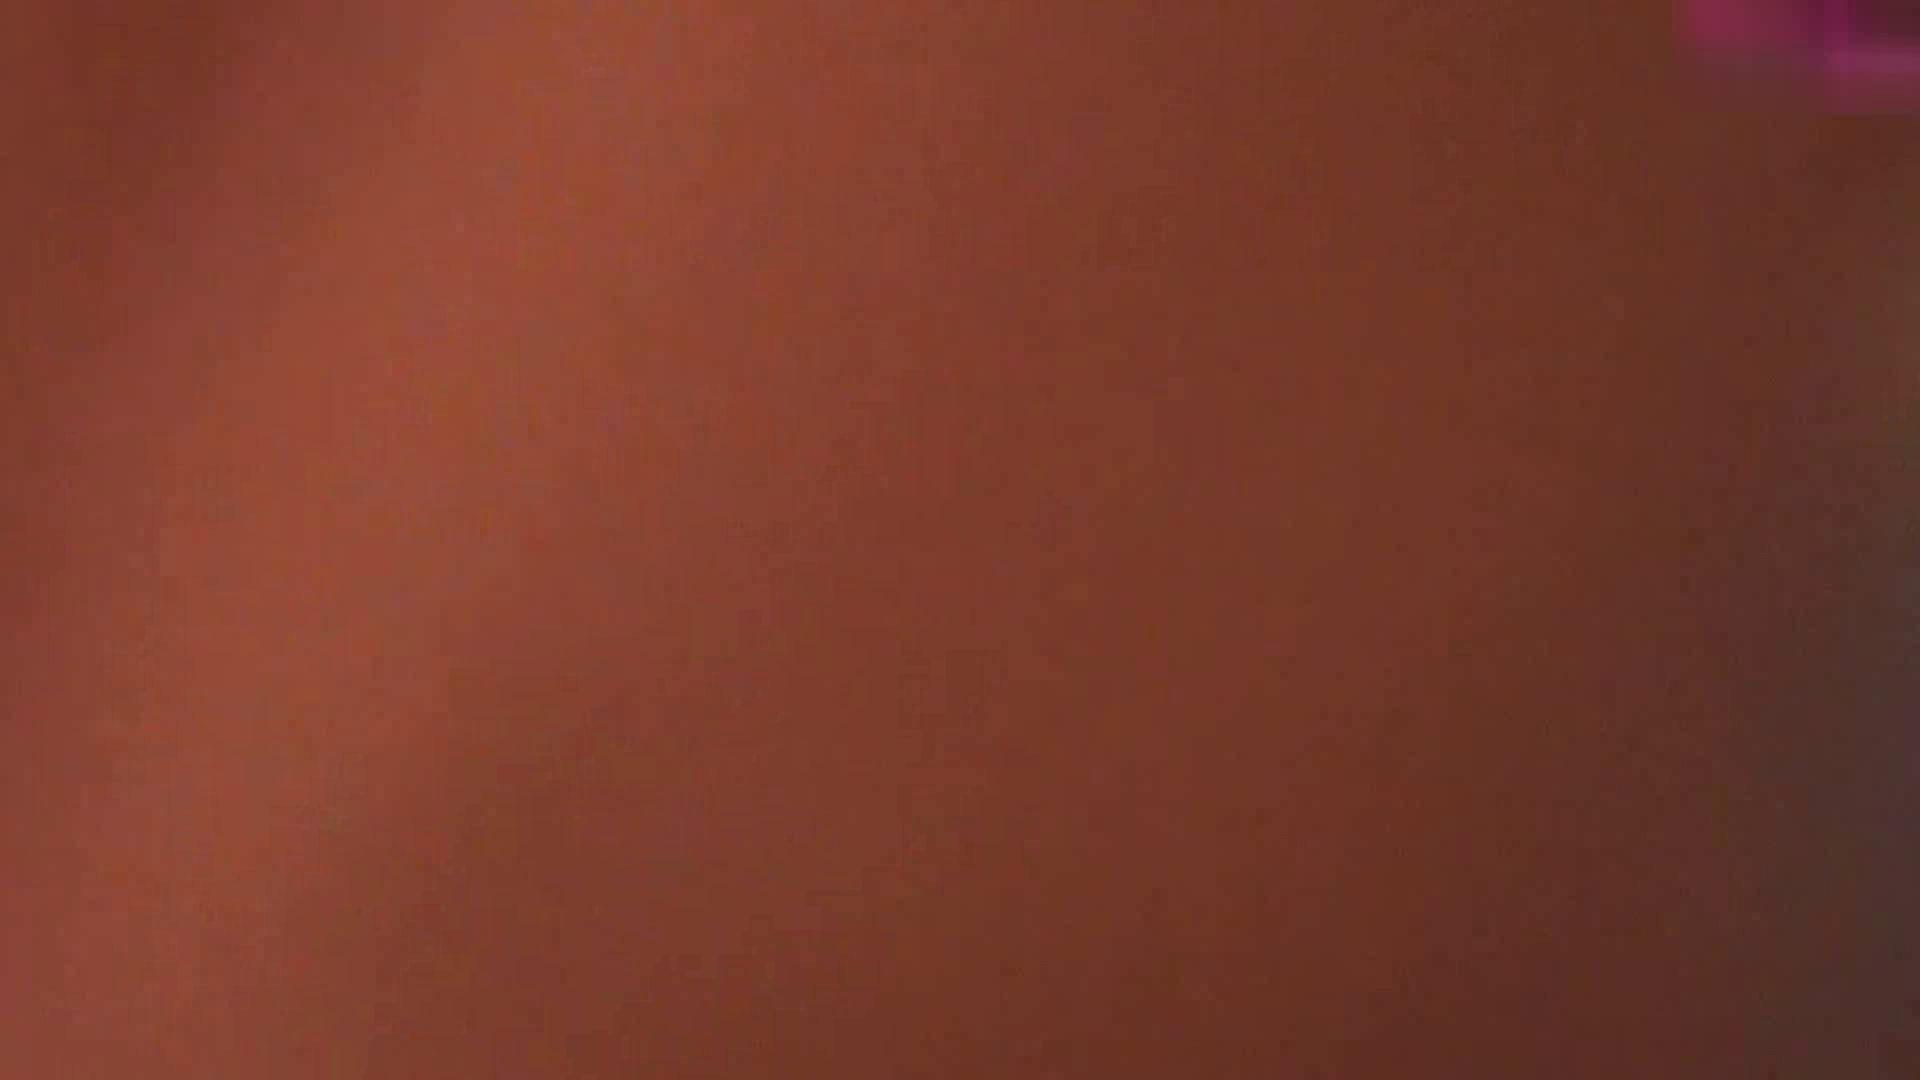 S級厳選美女ビッチガールVol.23 セックス  103枚 1